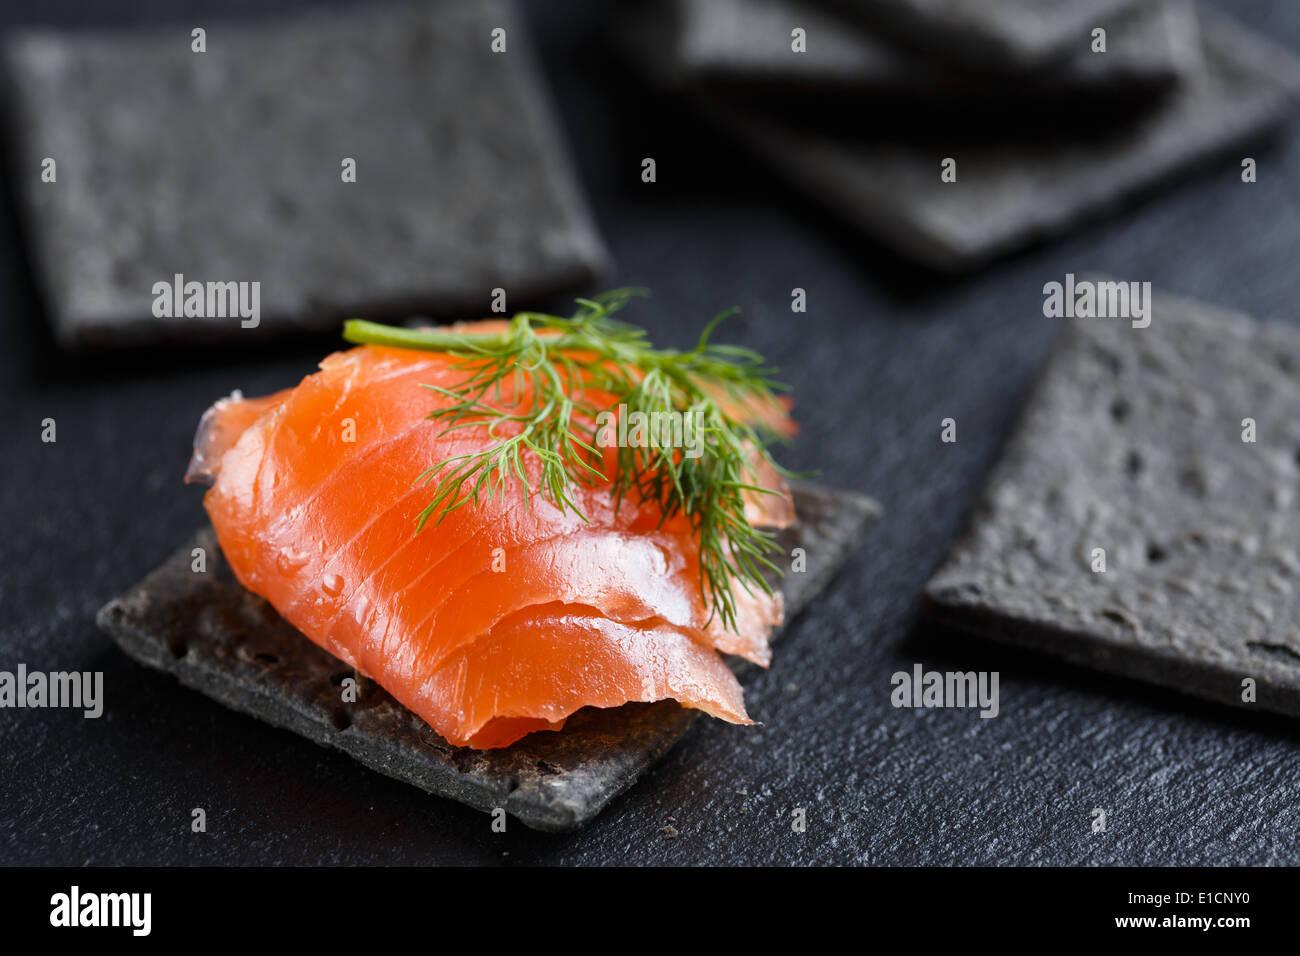 Smoked Salmon on black cracker - Stock Image